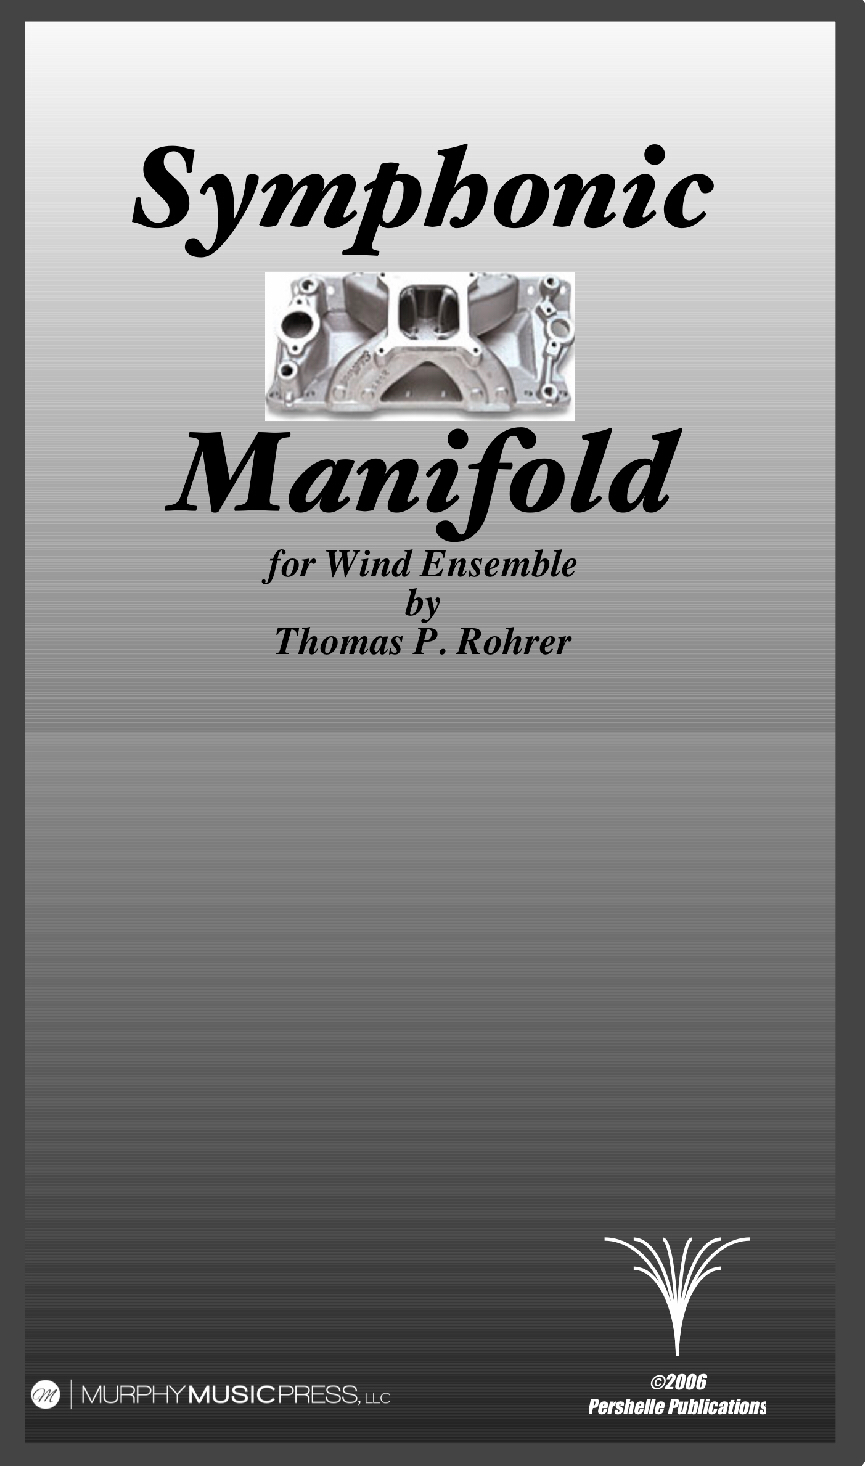 Symphonic Manifold by Thomas Rohrer